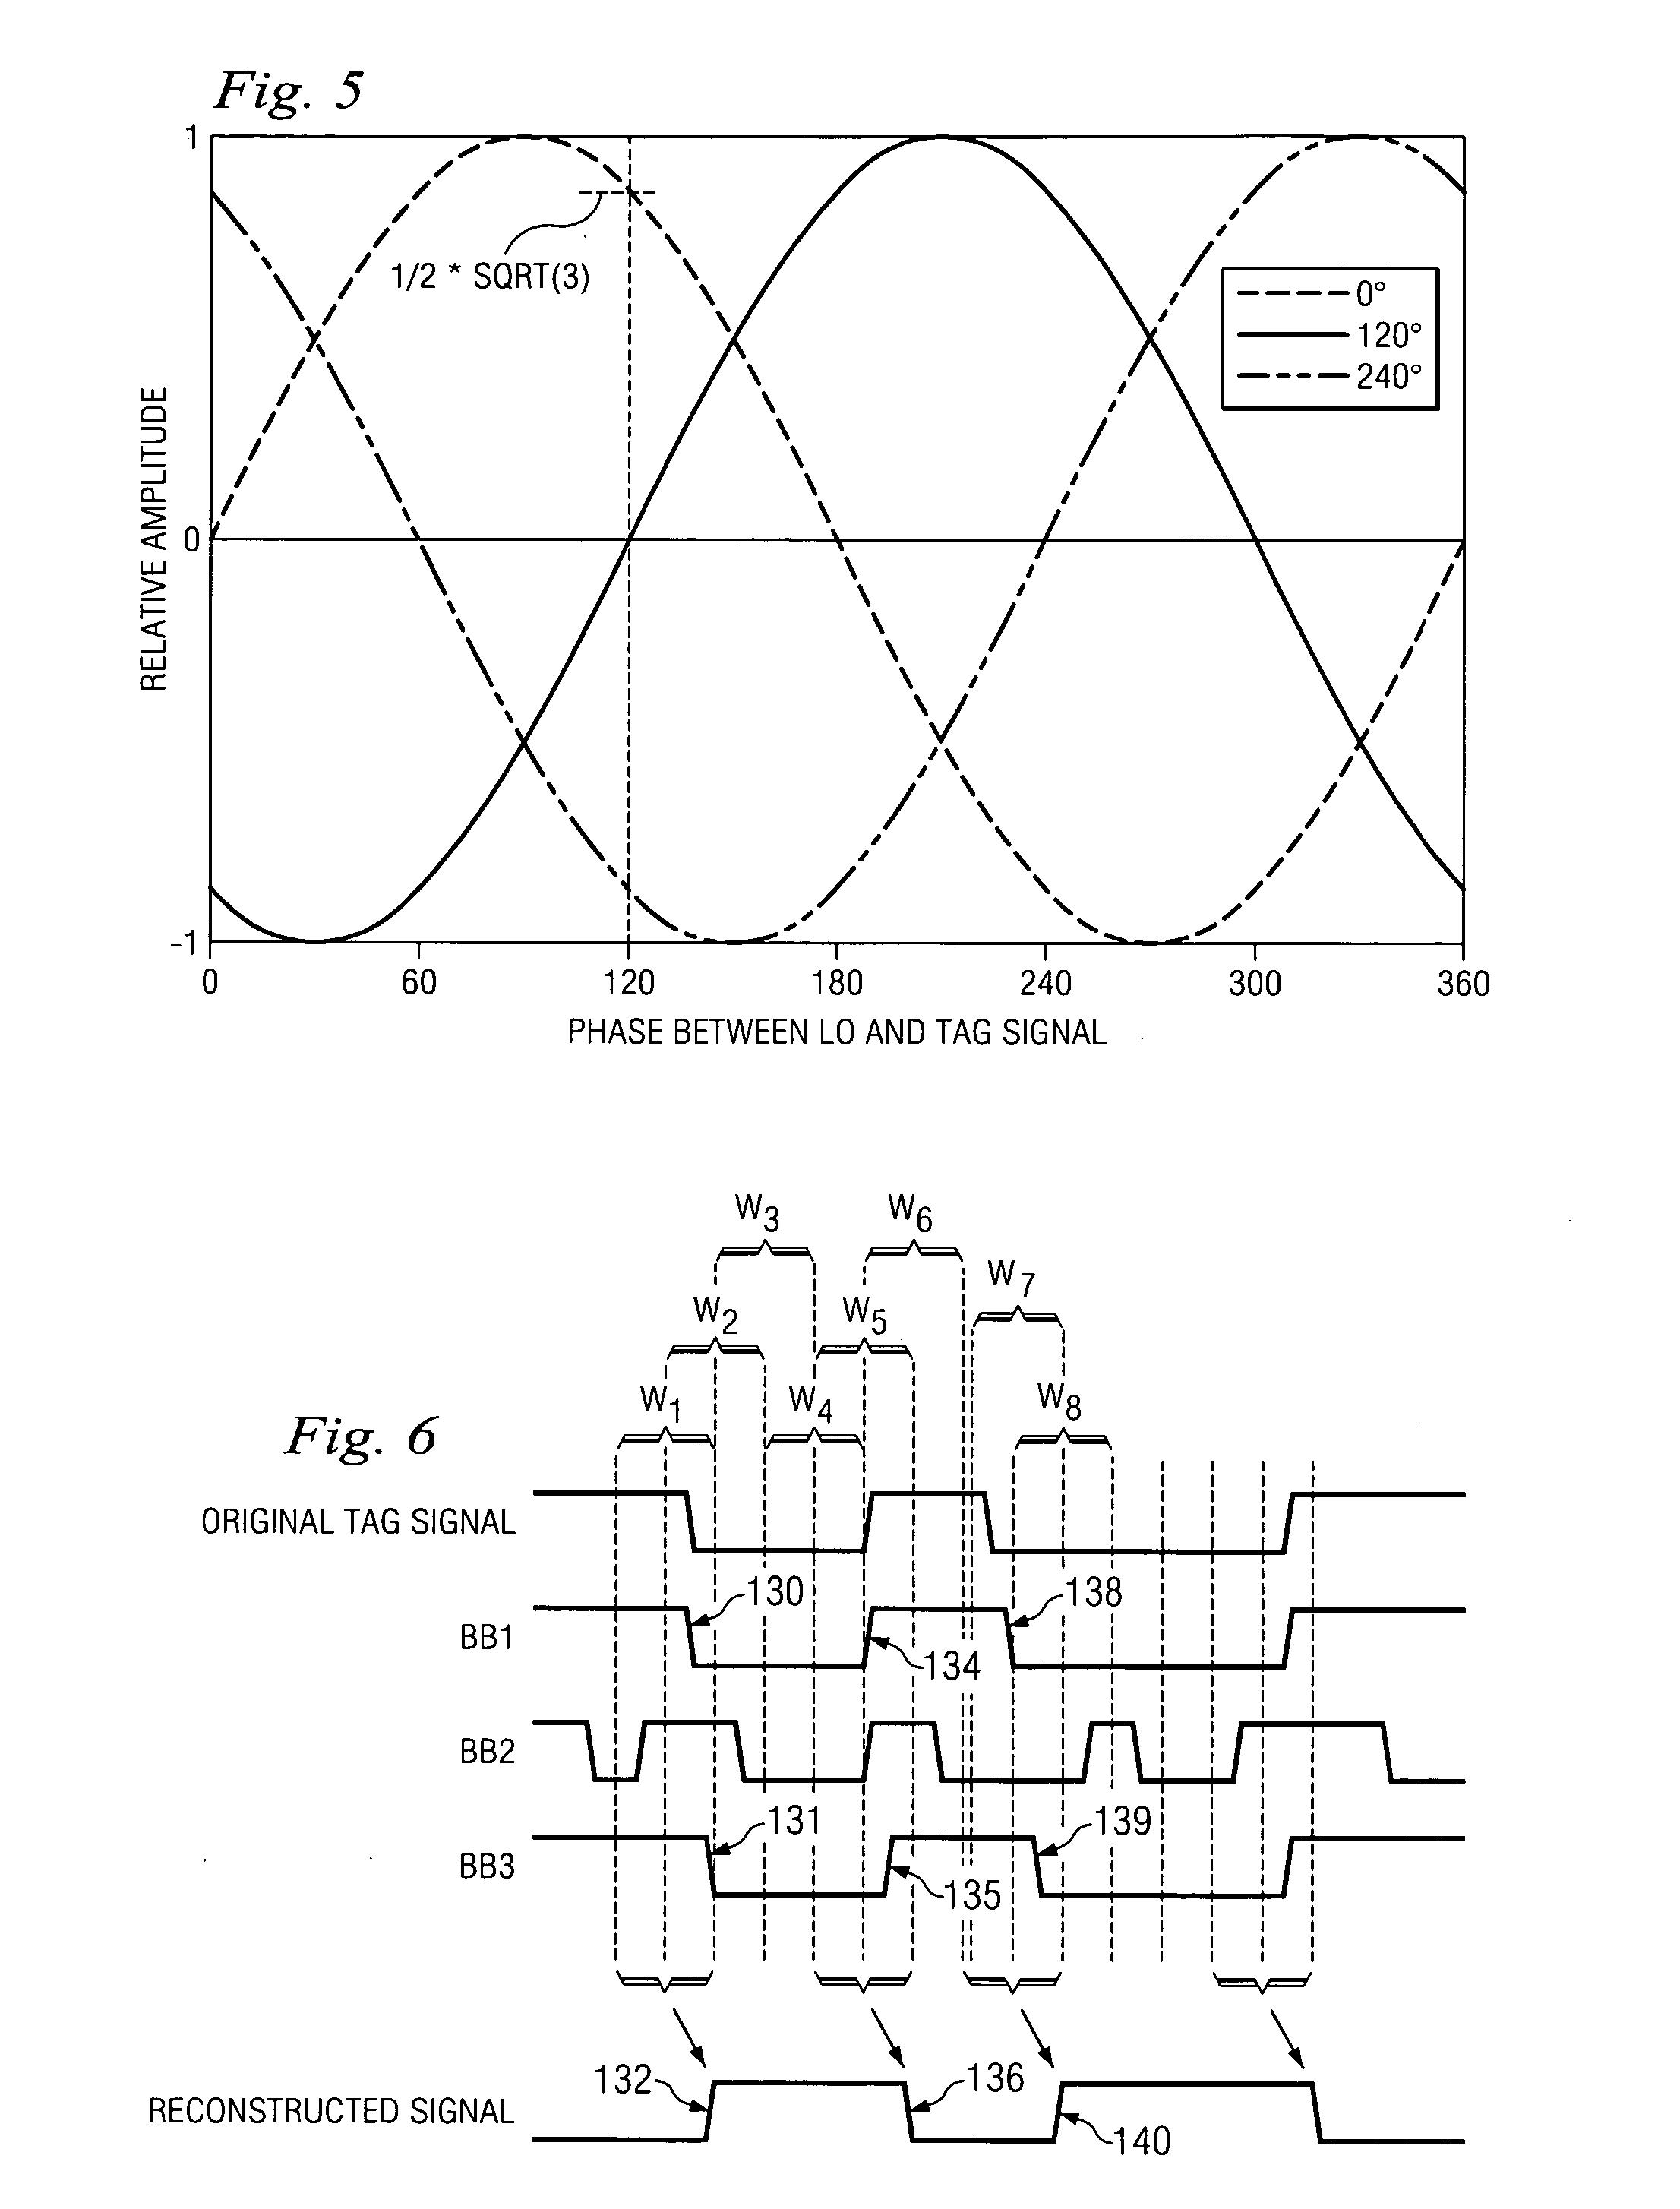 High Voltage Supply Circuit Diagram Tradeoficcom Wiring Online Lowvolts Alarm Highvoltage Data